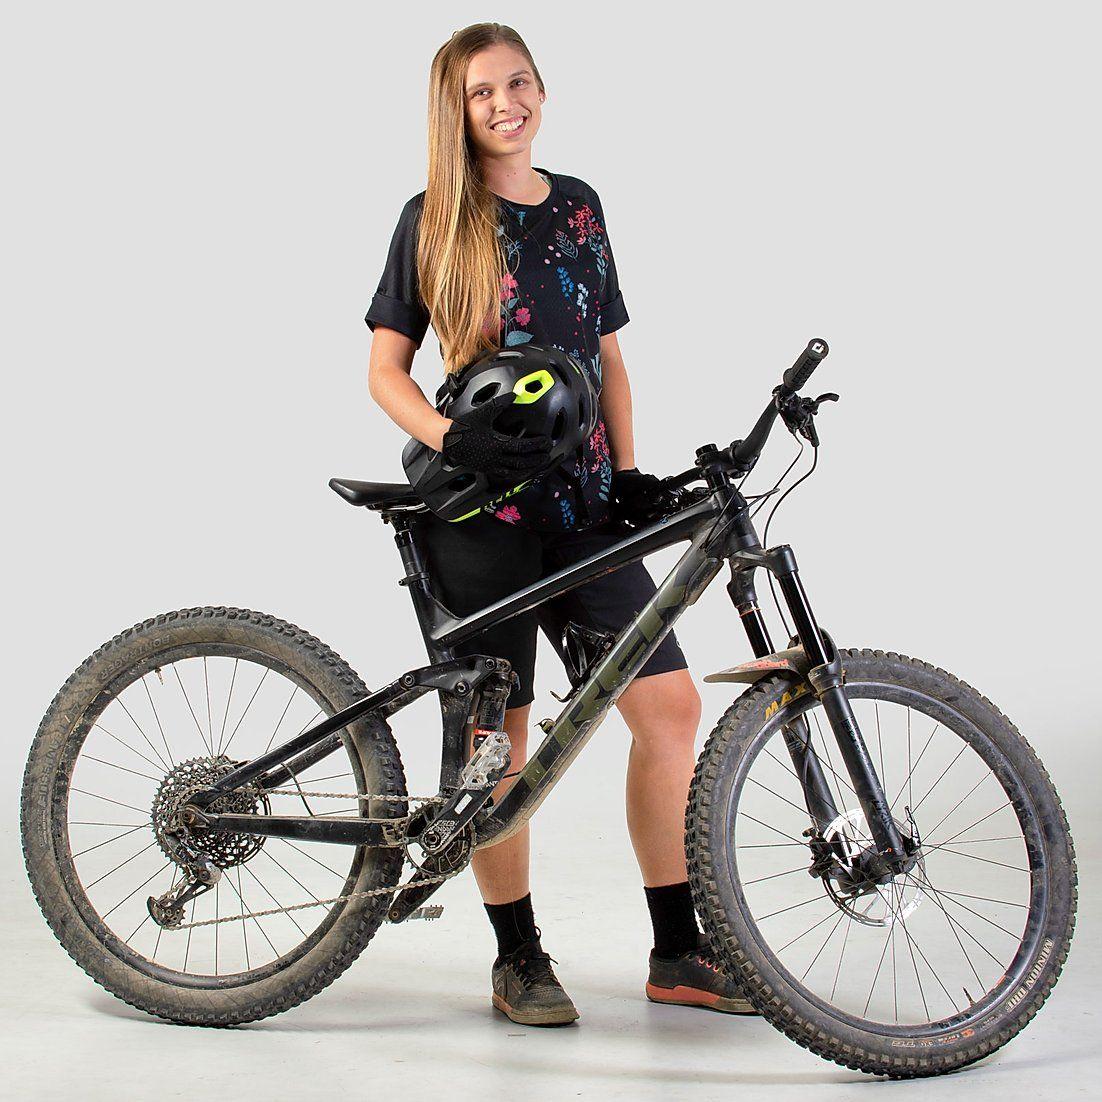 Raglan Shorty Sleeve Floral R Mountain Bike Jersey Women S Floral Enduro Mtb Shirt In 2020 Outdoor Apparel Outdoor Shirt Bike Jersey